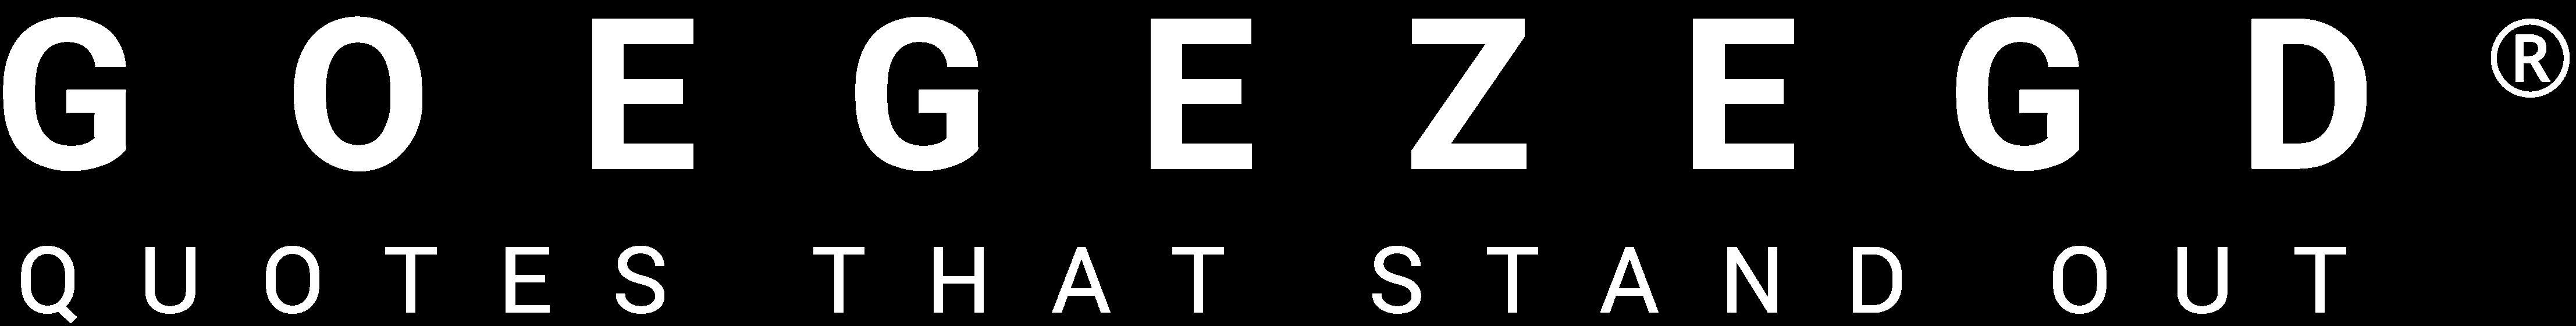 GOEGEZEGD ®